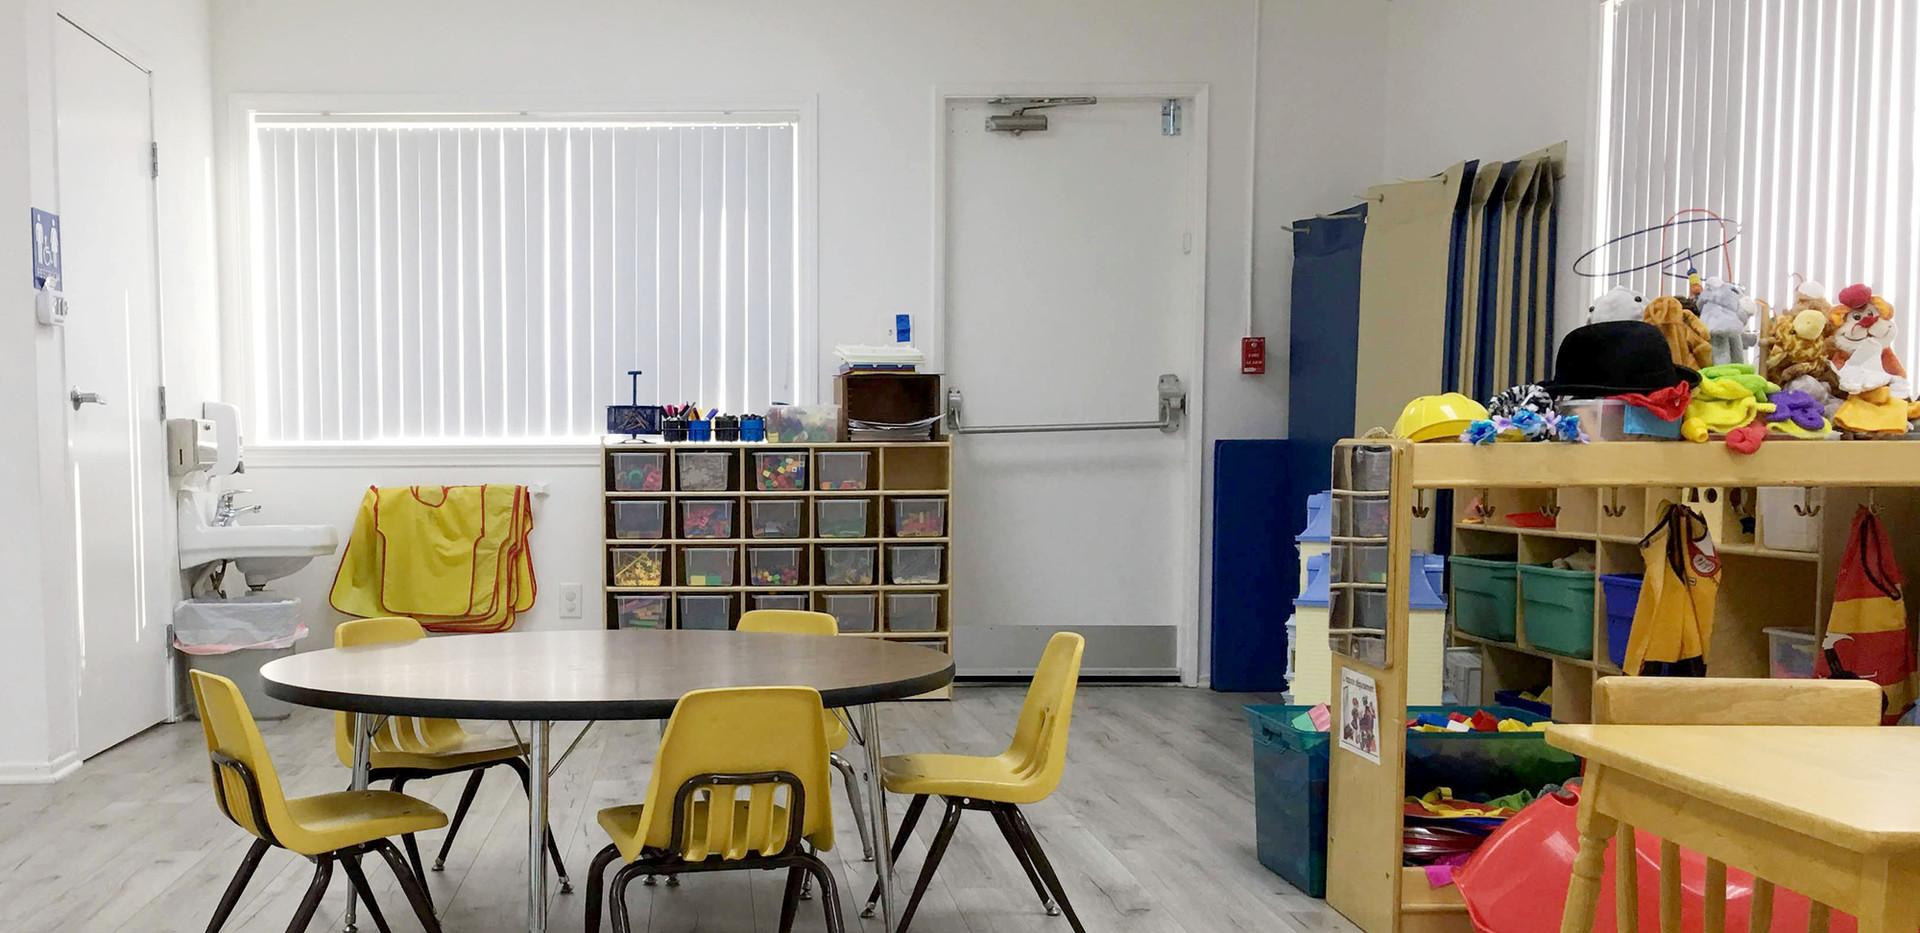 facilities_0025_IMG_0611.jpg